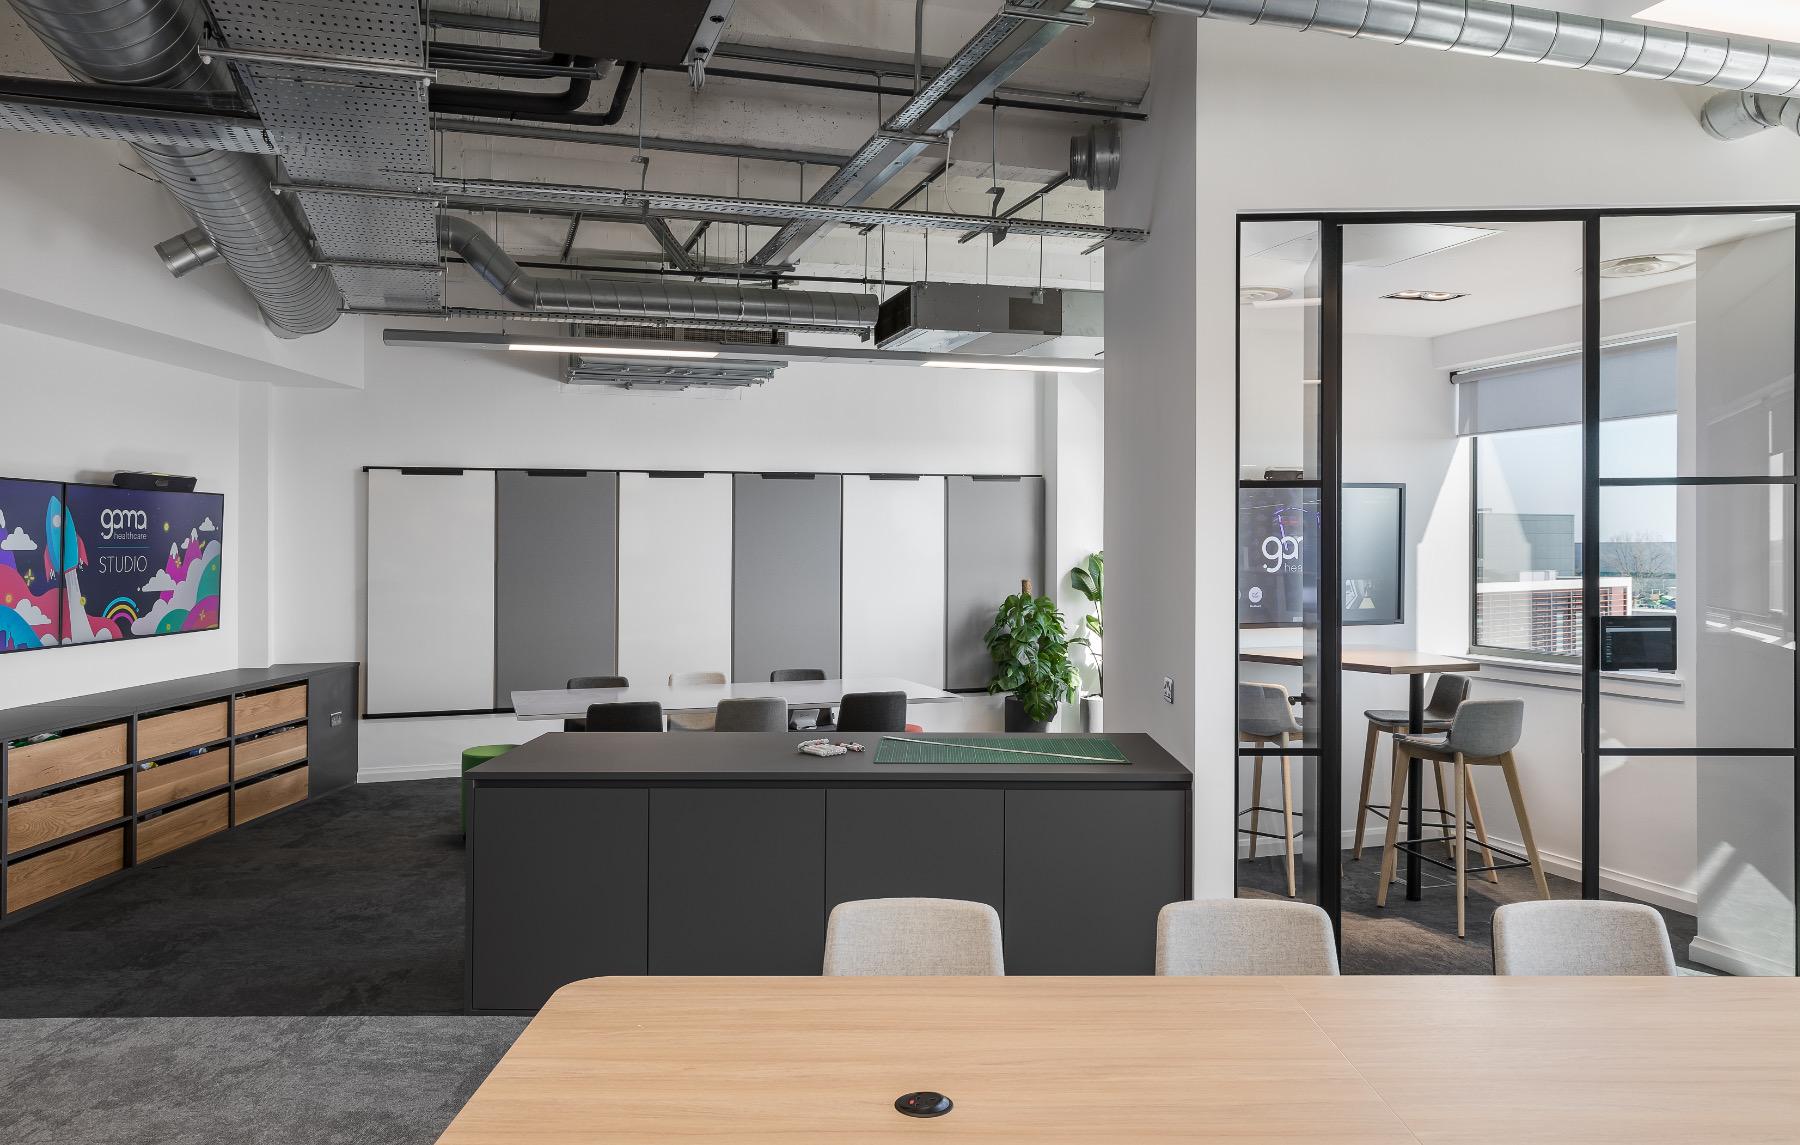 gama-healthcare-office-12